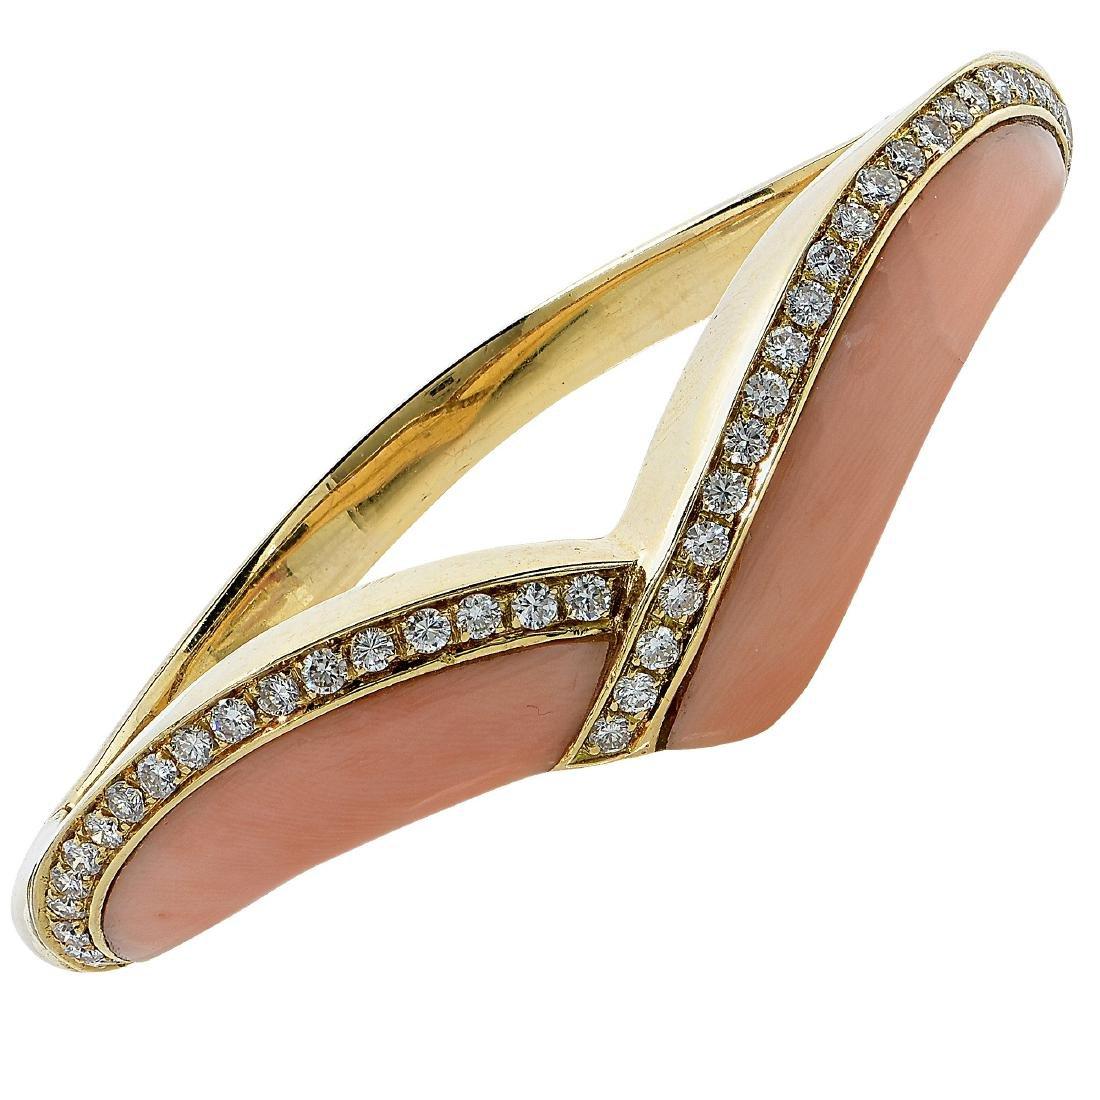 18K Yellow Gold Coral Diamond Bangle